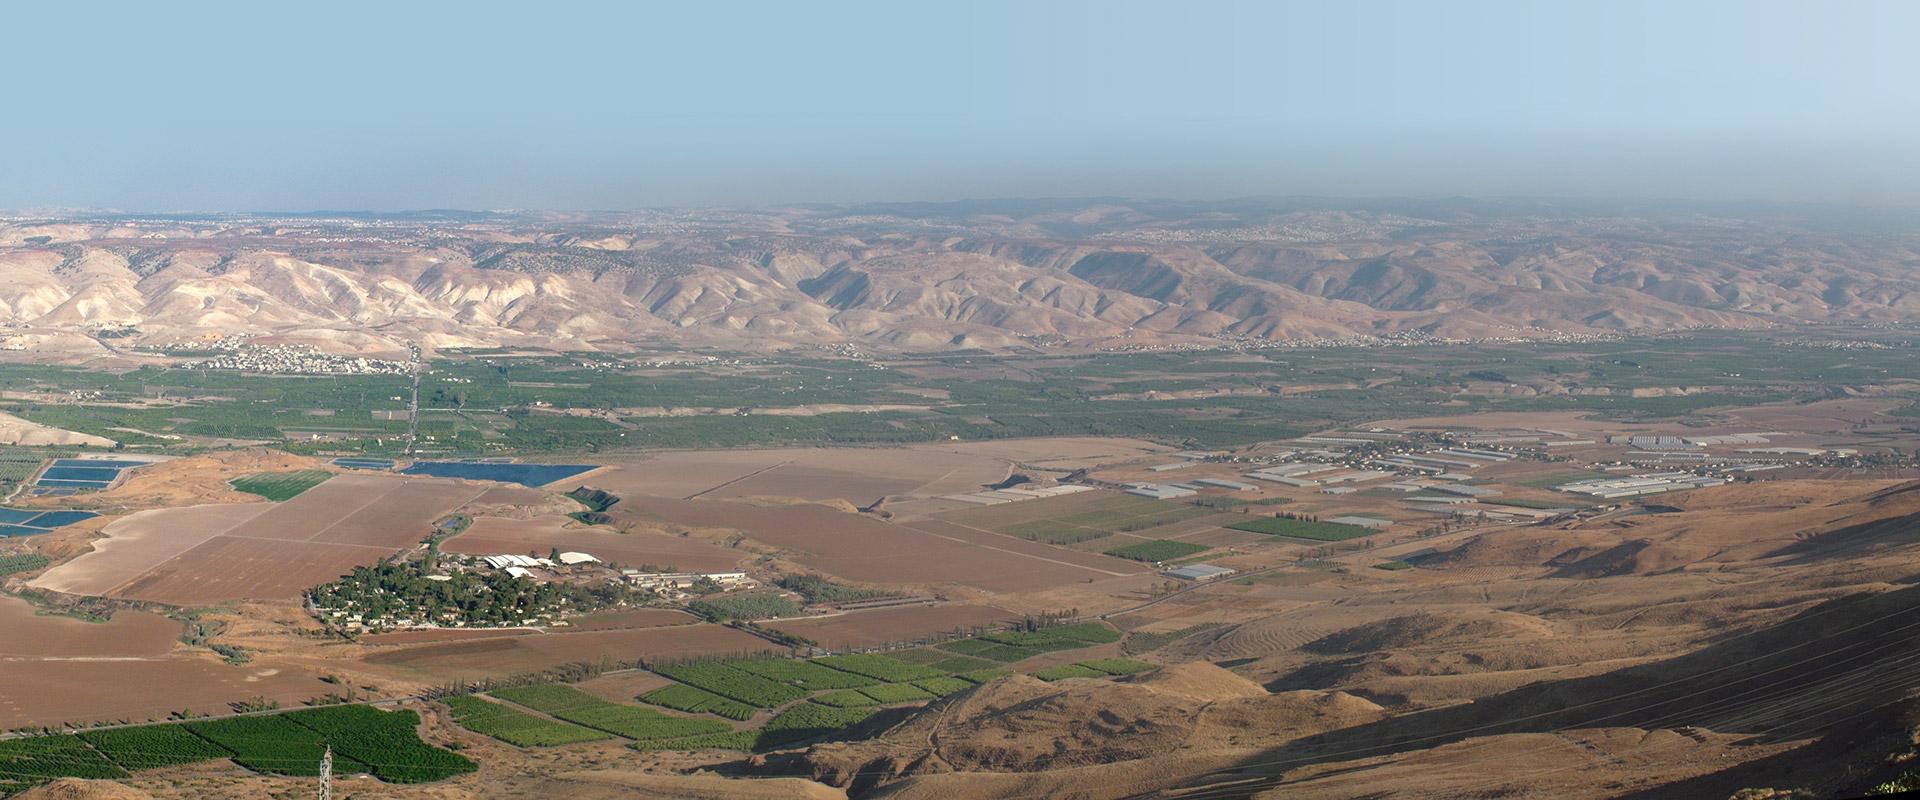 gilboa-and-jordan-valley-panorama